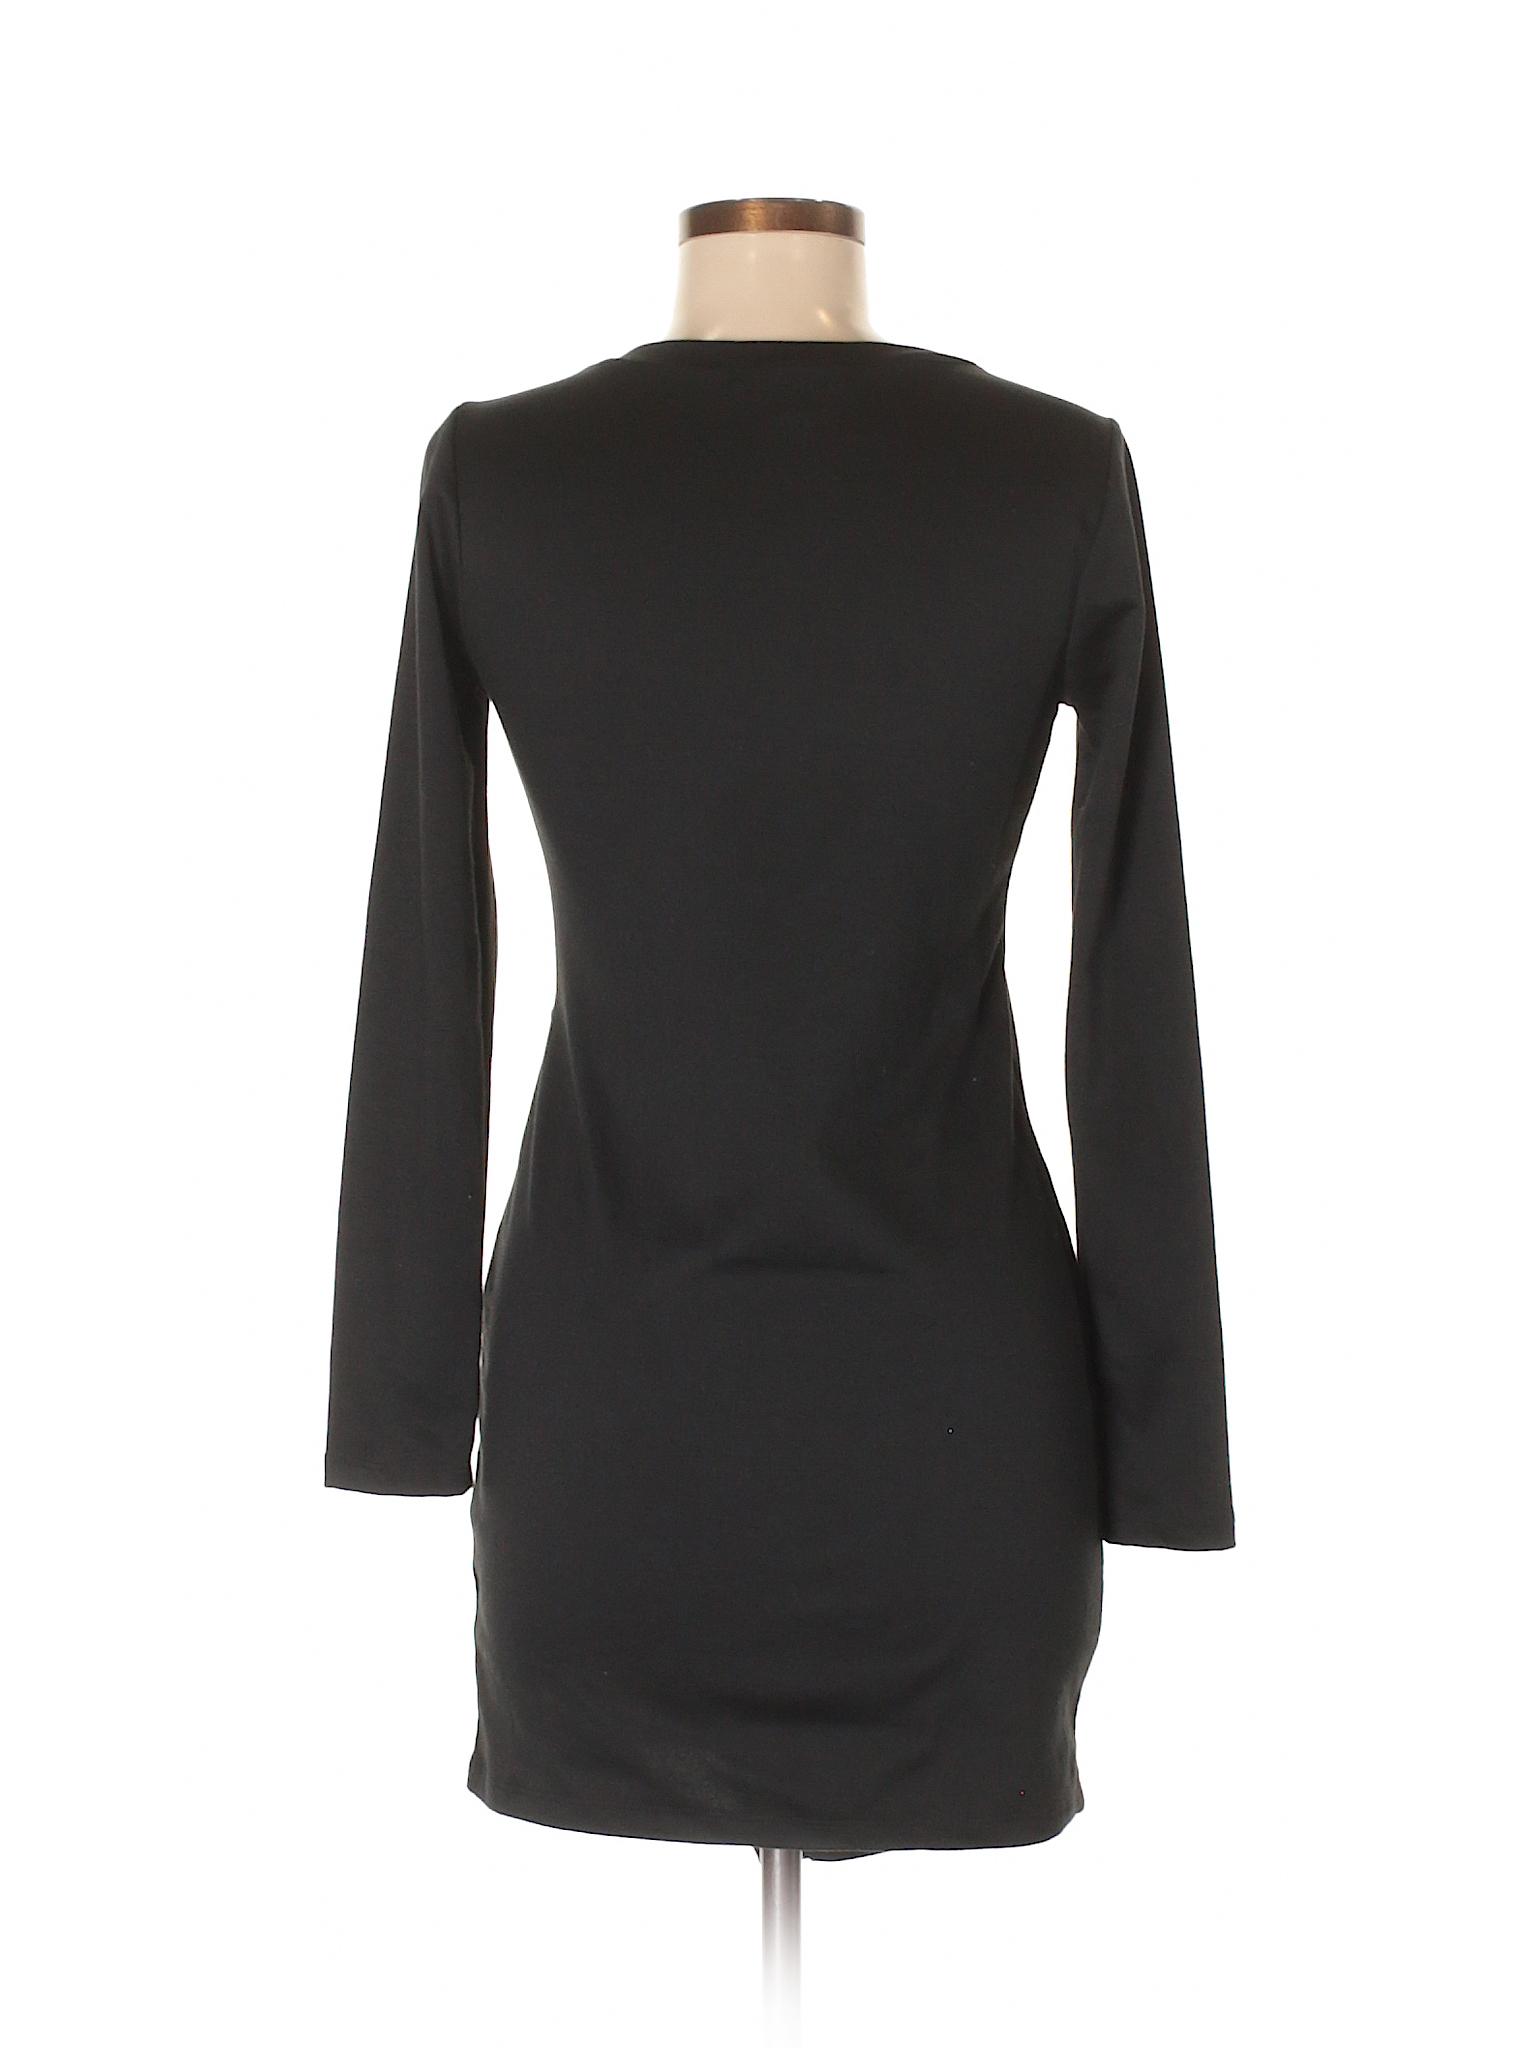 Dress s by r ATV d Boutique winter o Casual a O5zPxFnq4